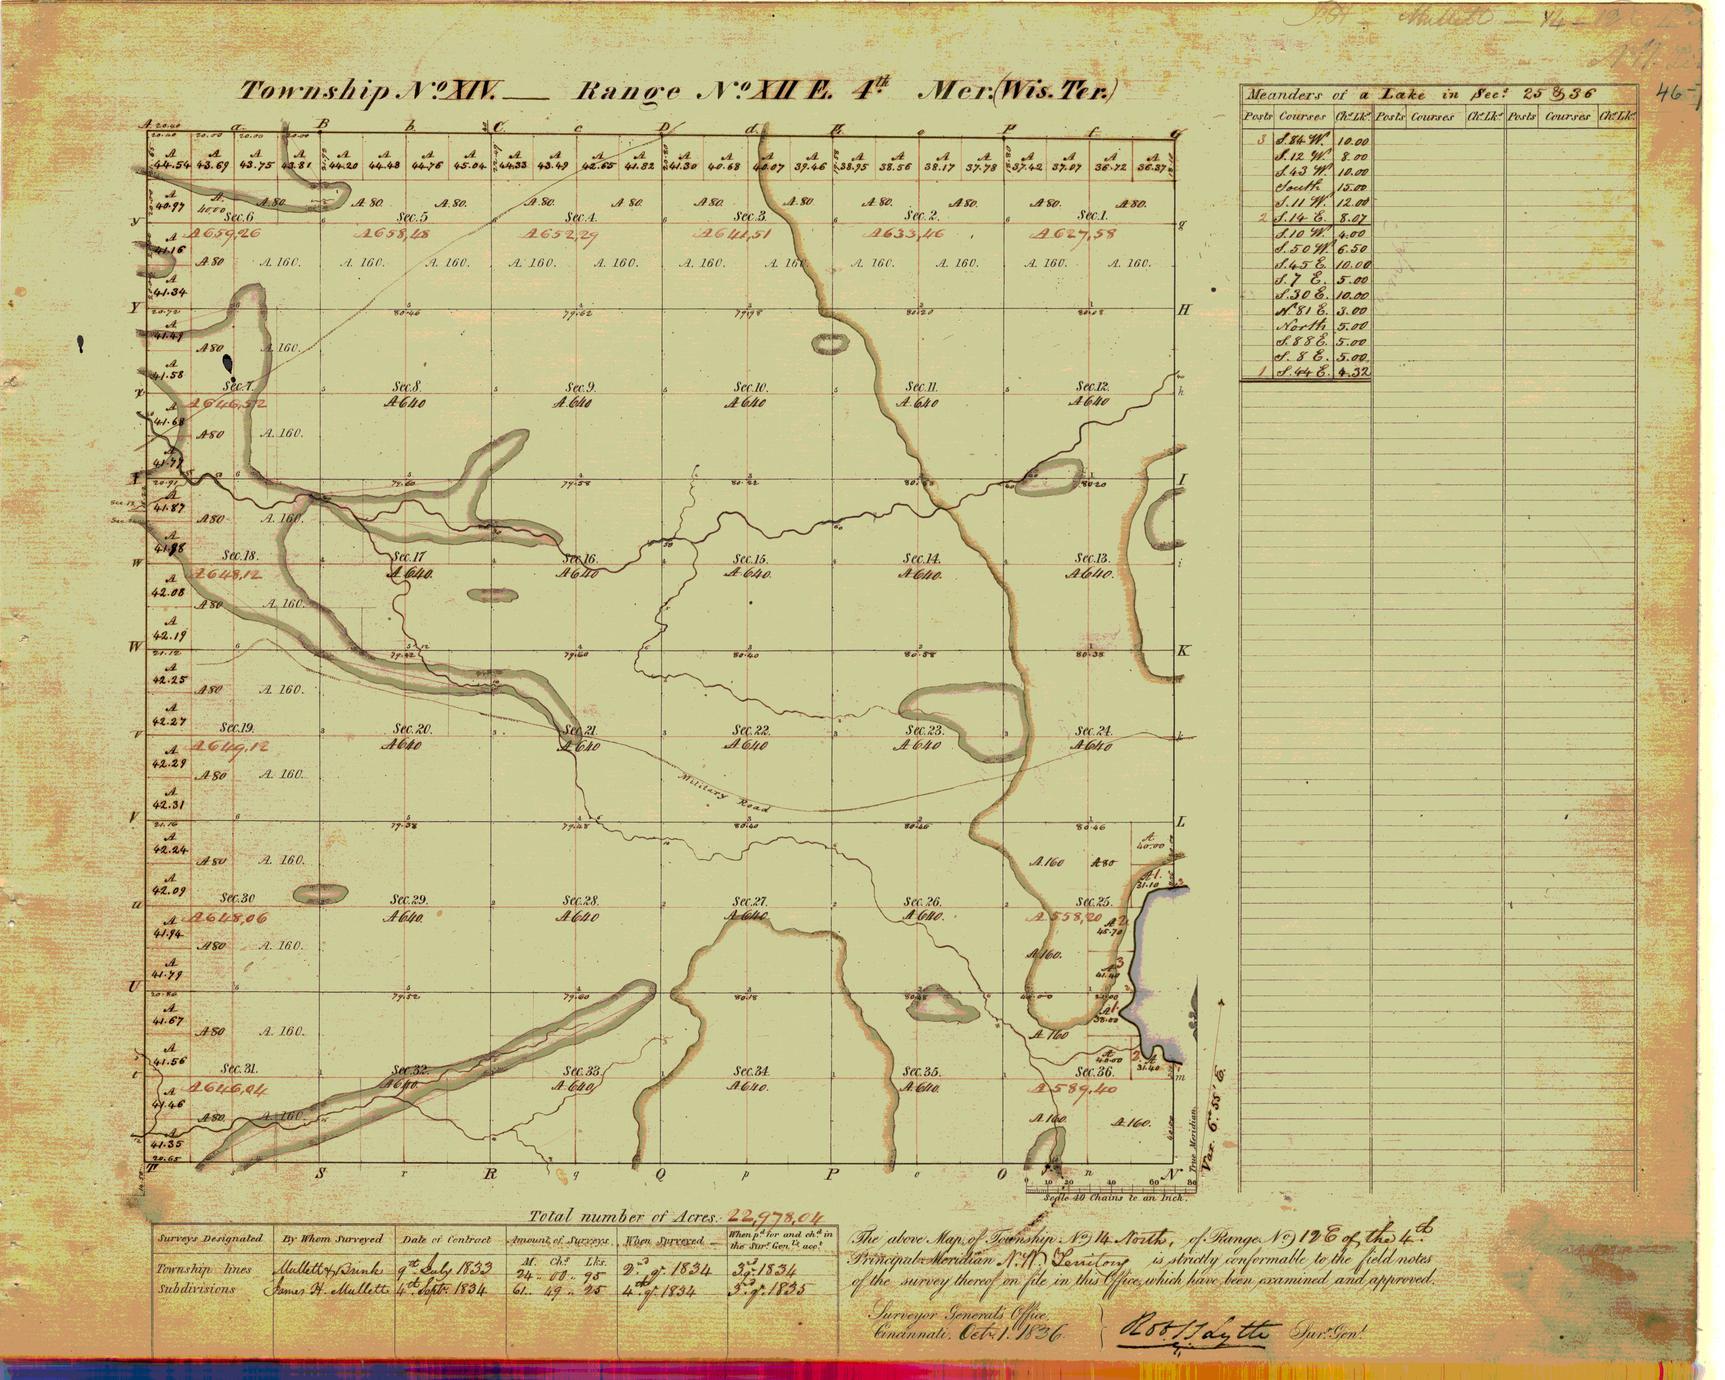 [Public Land Survey System map: Wisconsin Township 14 North, Range 12 East]